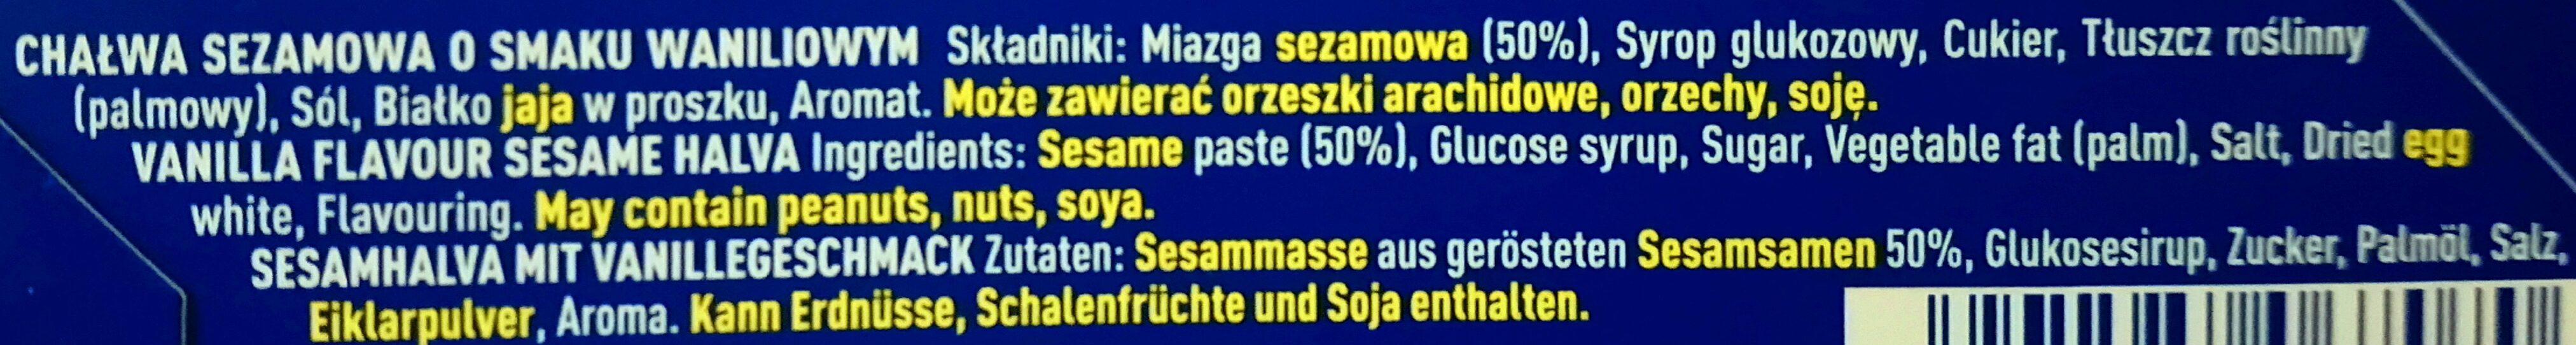 Sesame halva - Składniki - pl